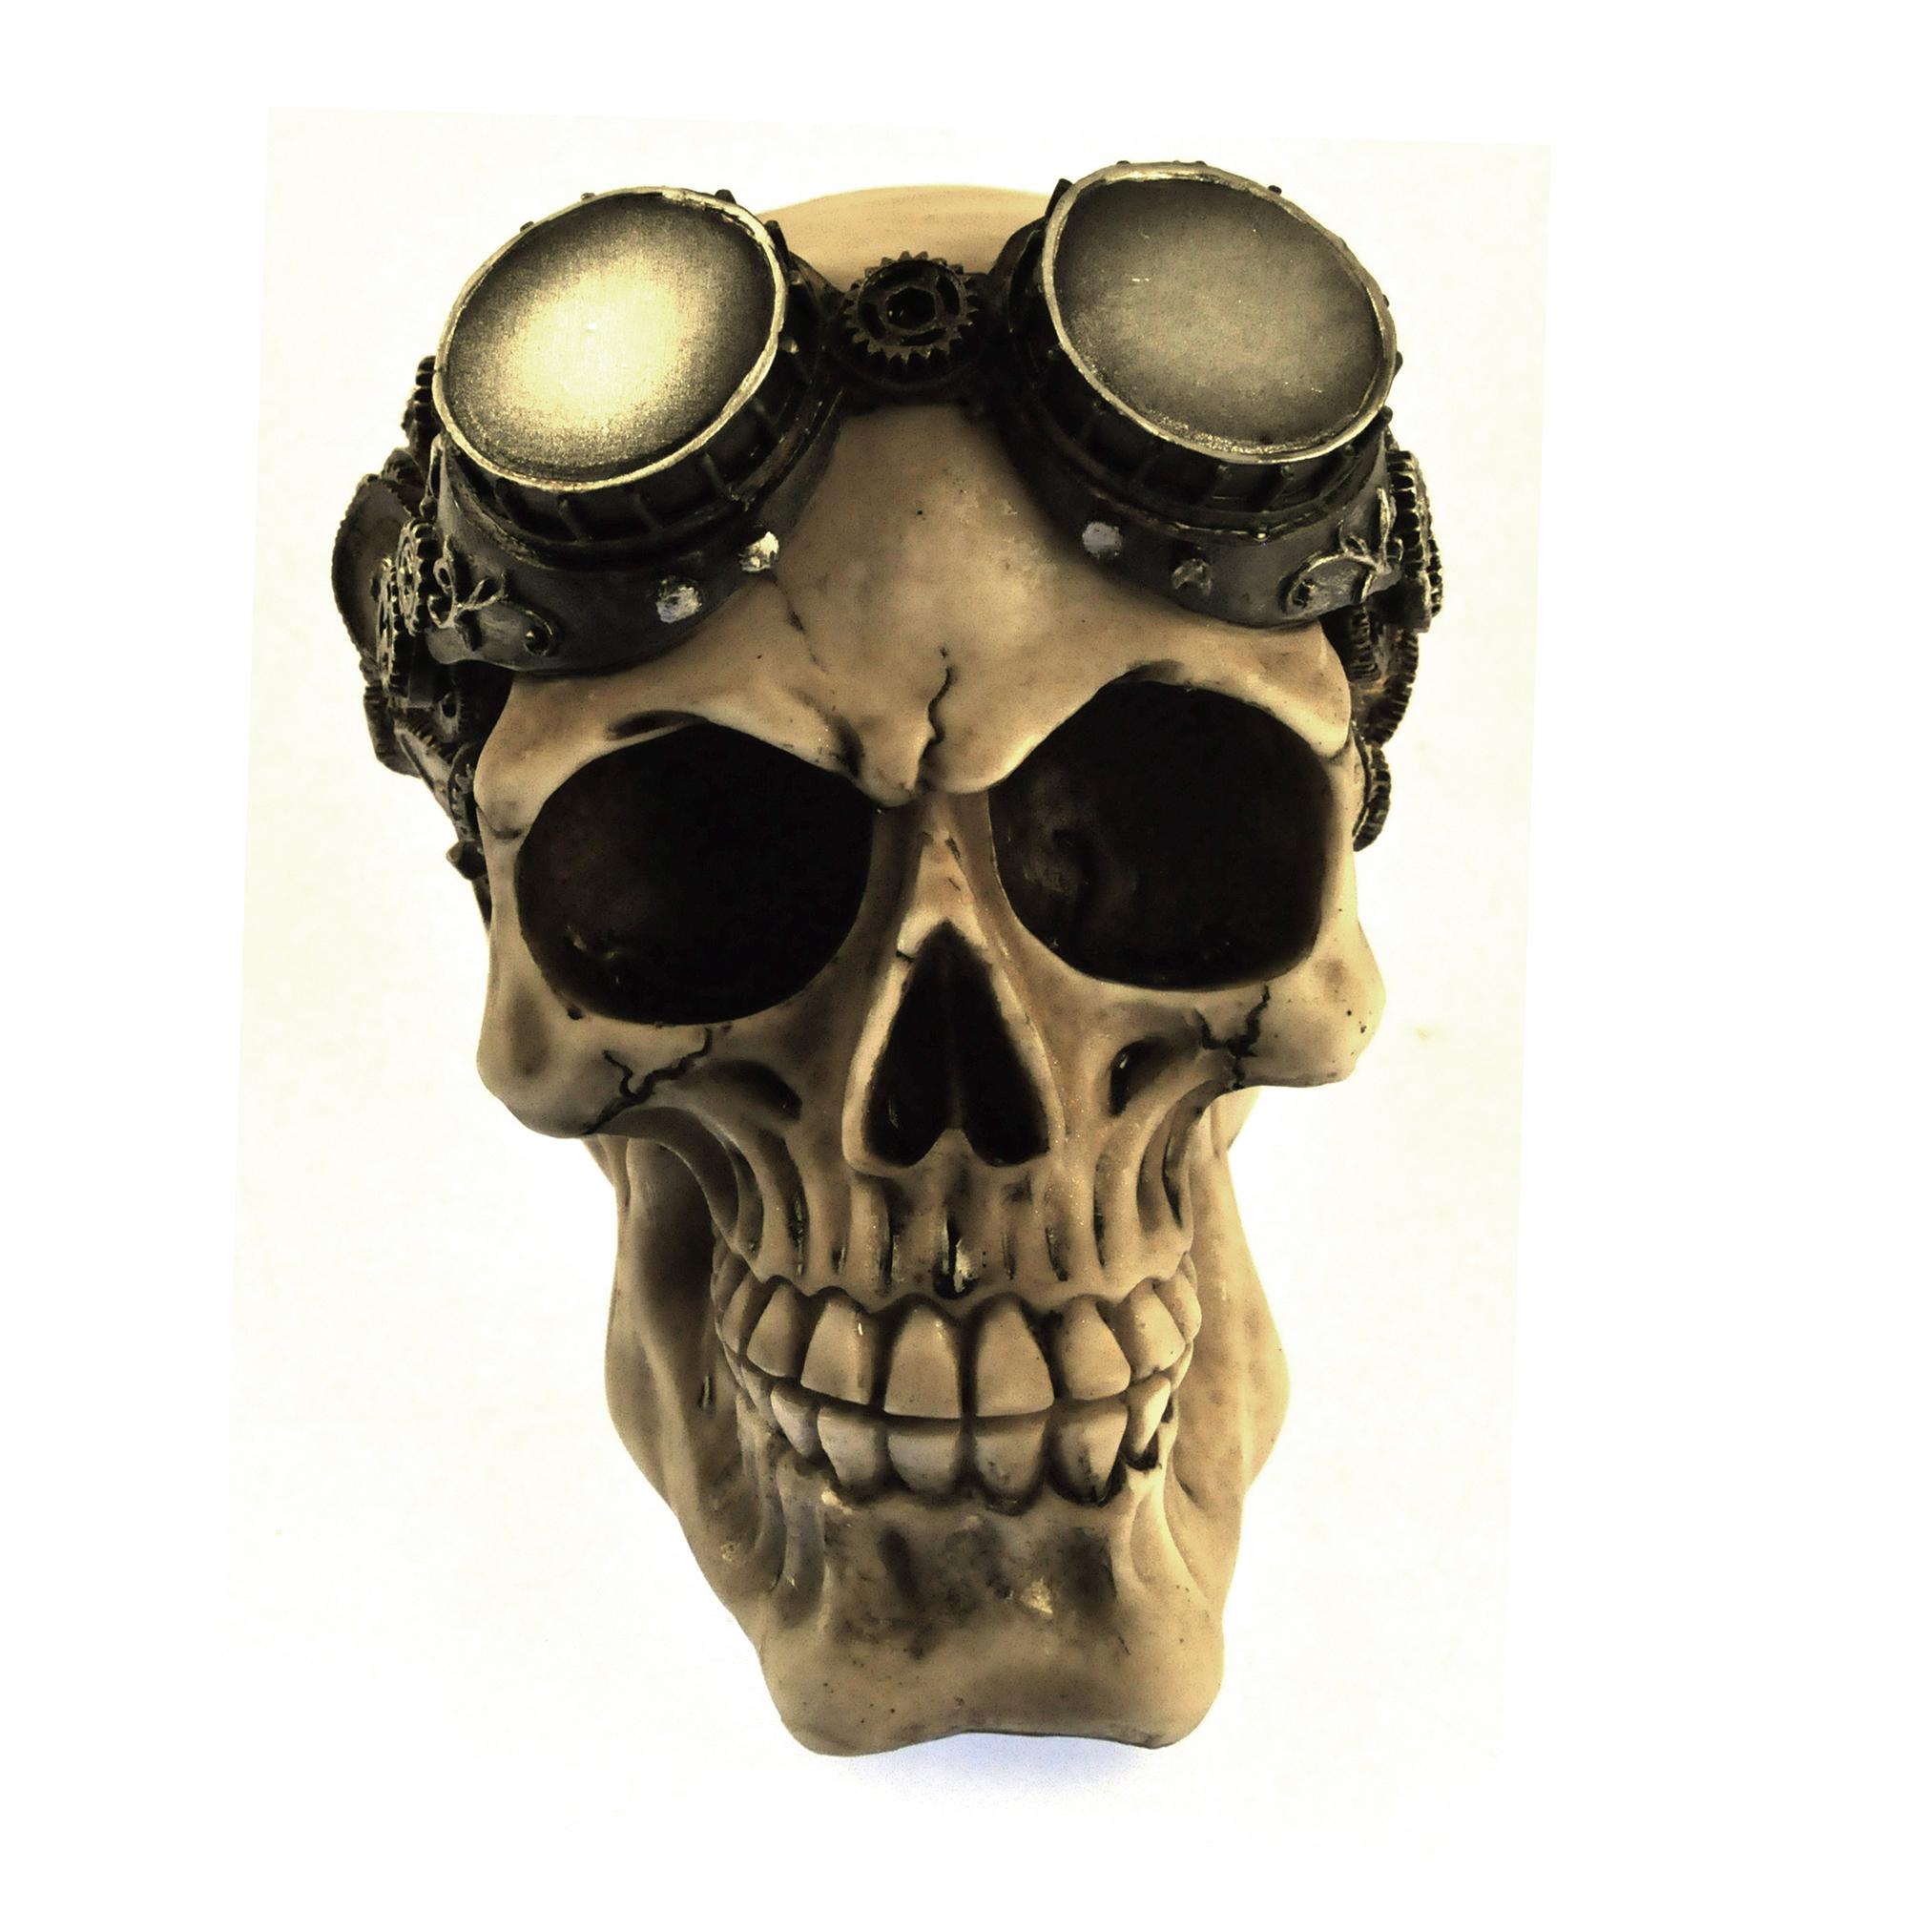 Steam Punk Skull Mechanical Brain And Goggles 15cm 6